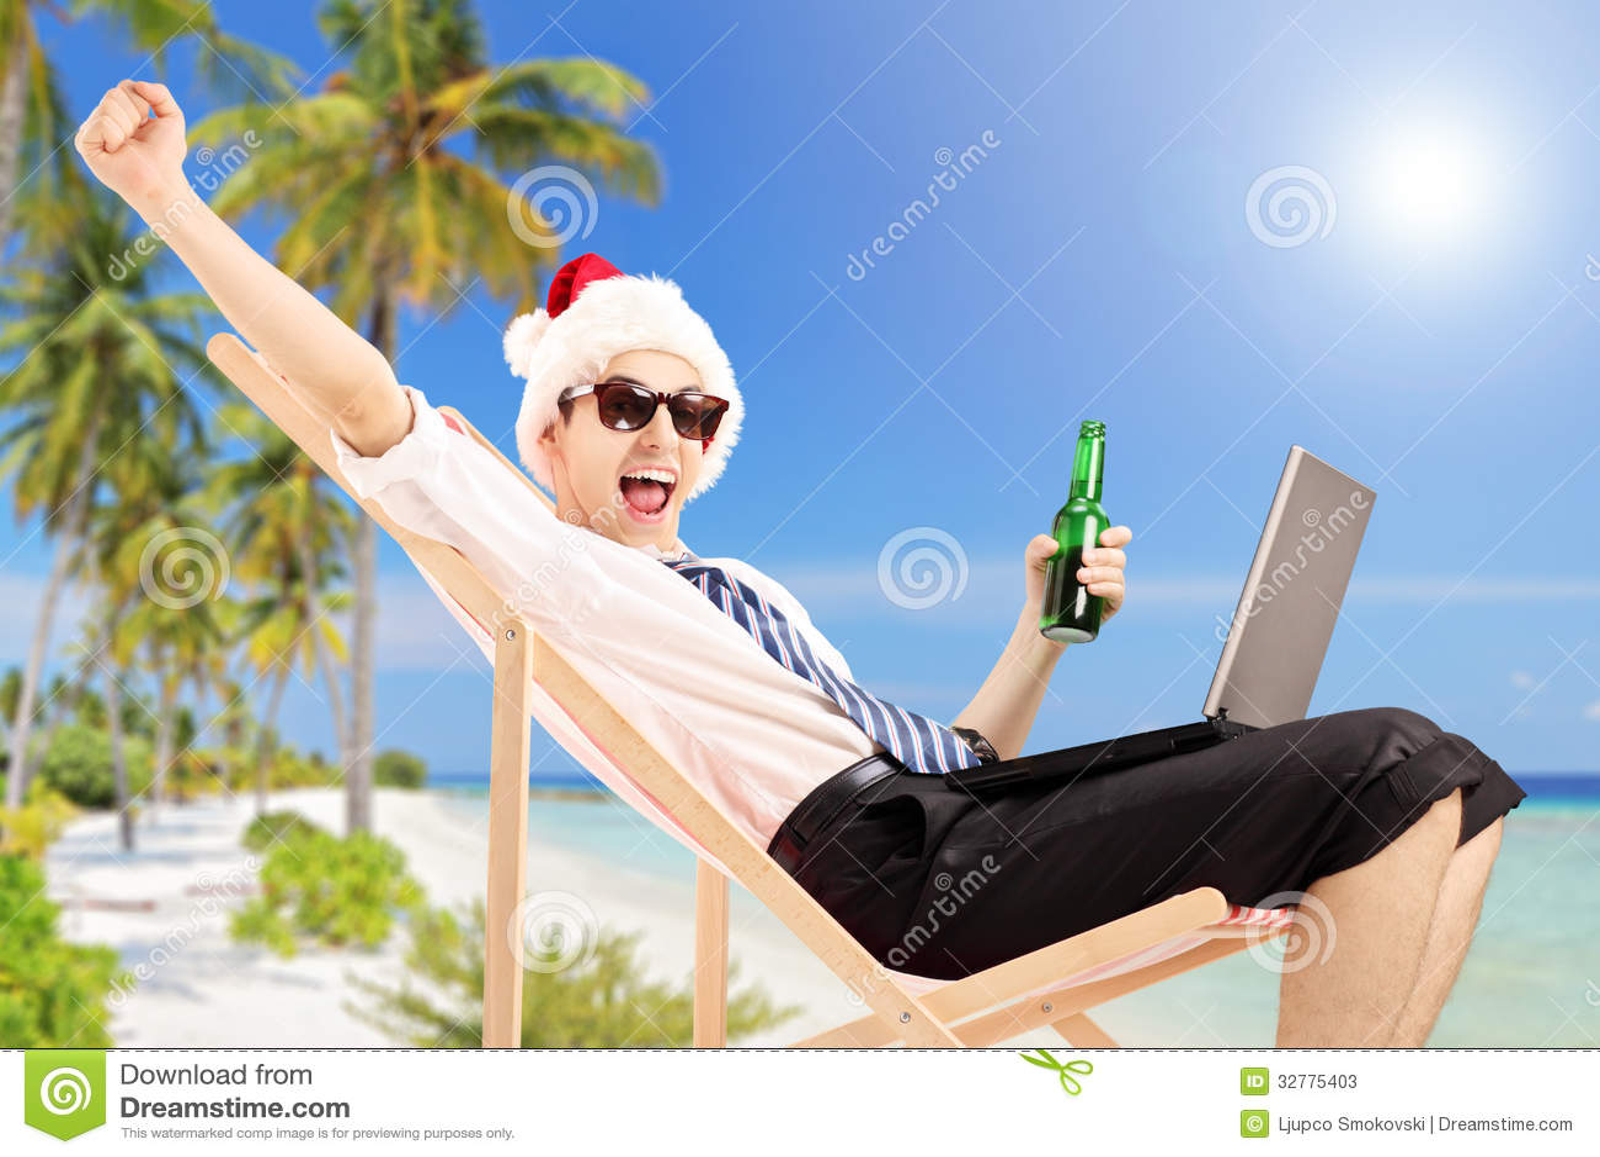 excited man with santa hat on a beach chair holding a beer beach umbrella clipart black and white beach umbrella clip art free